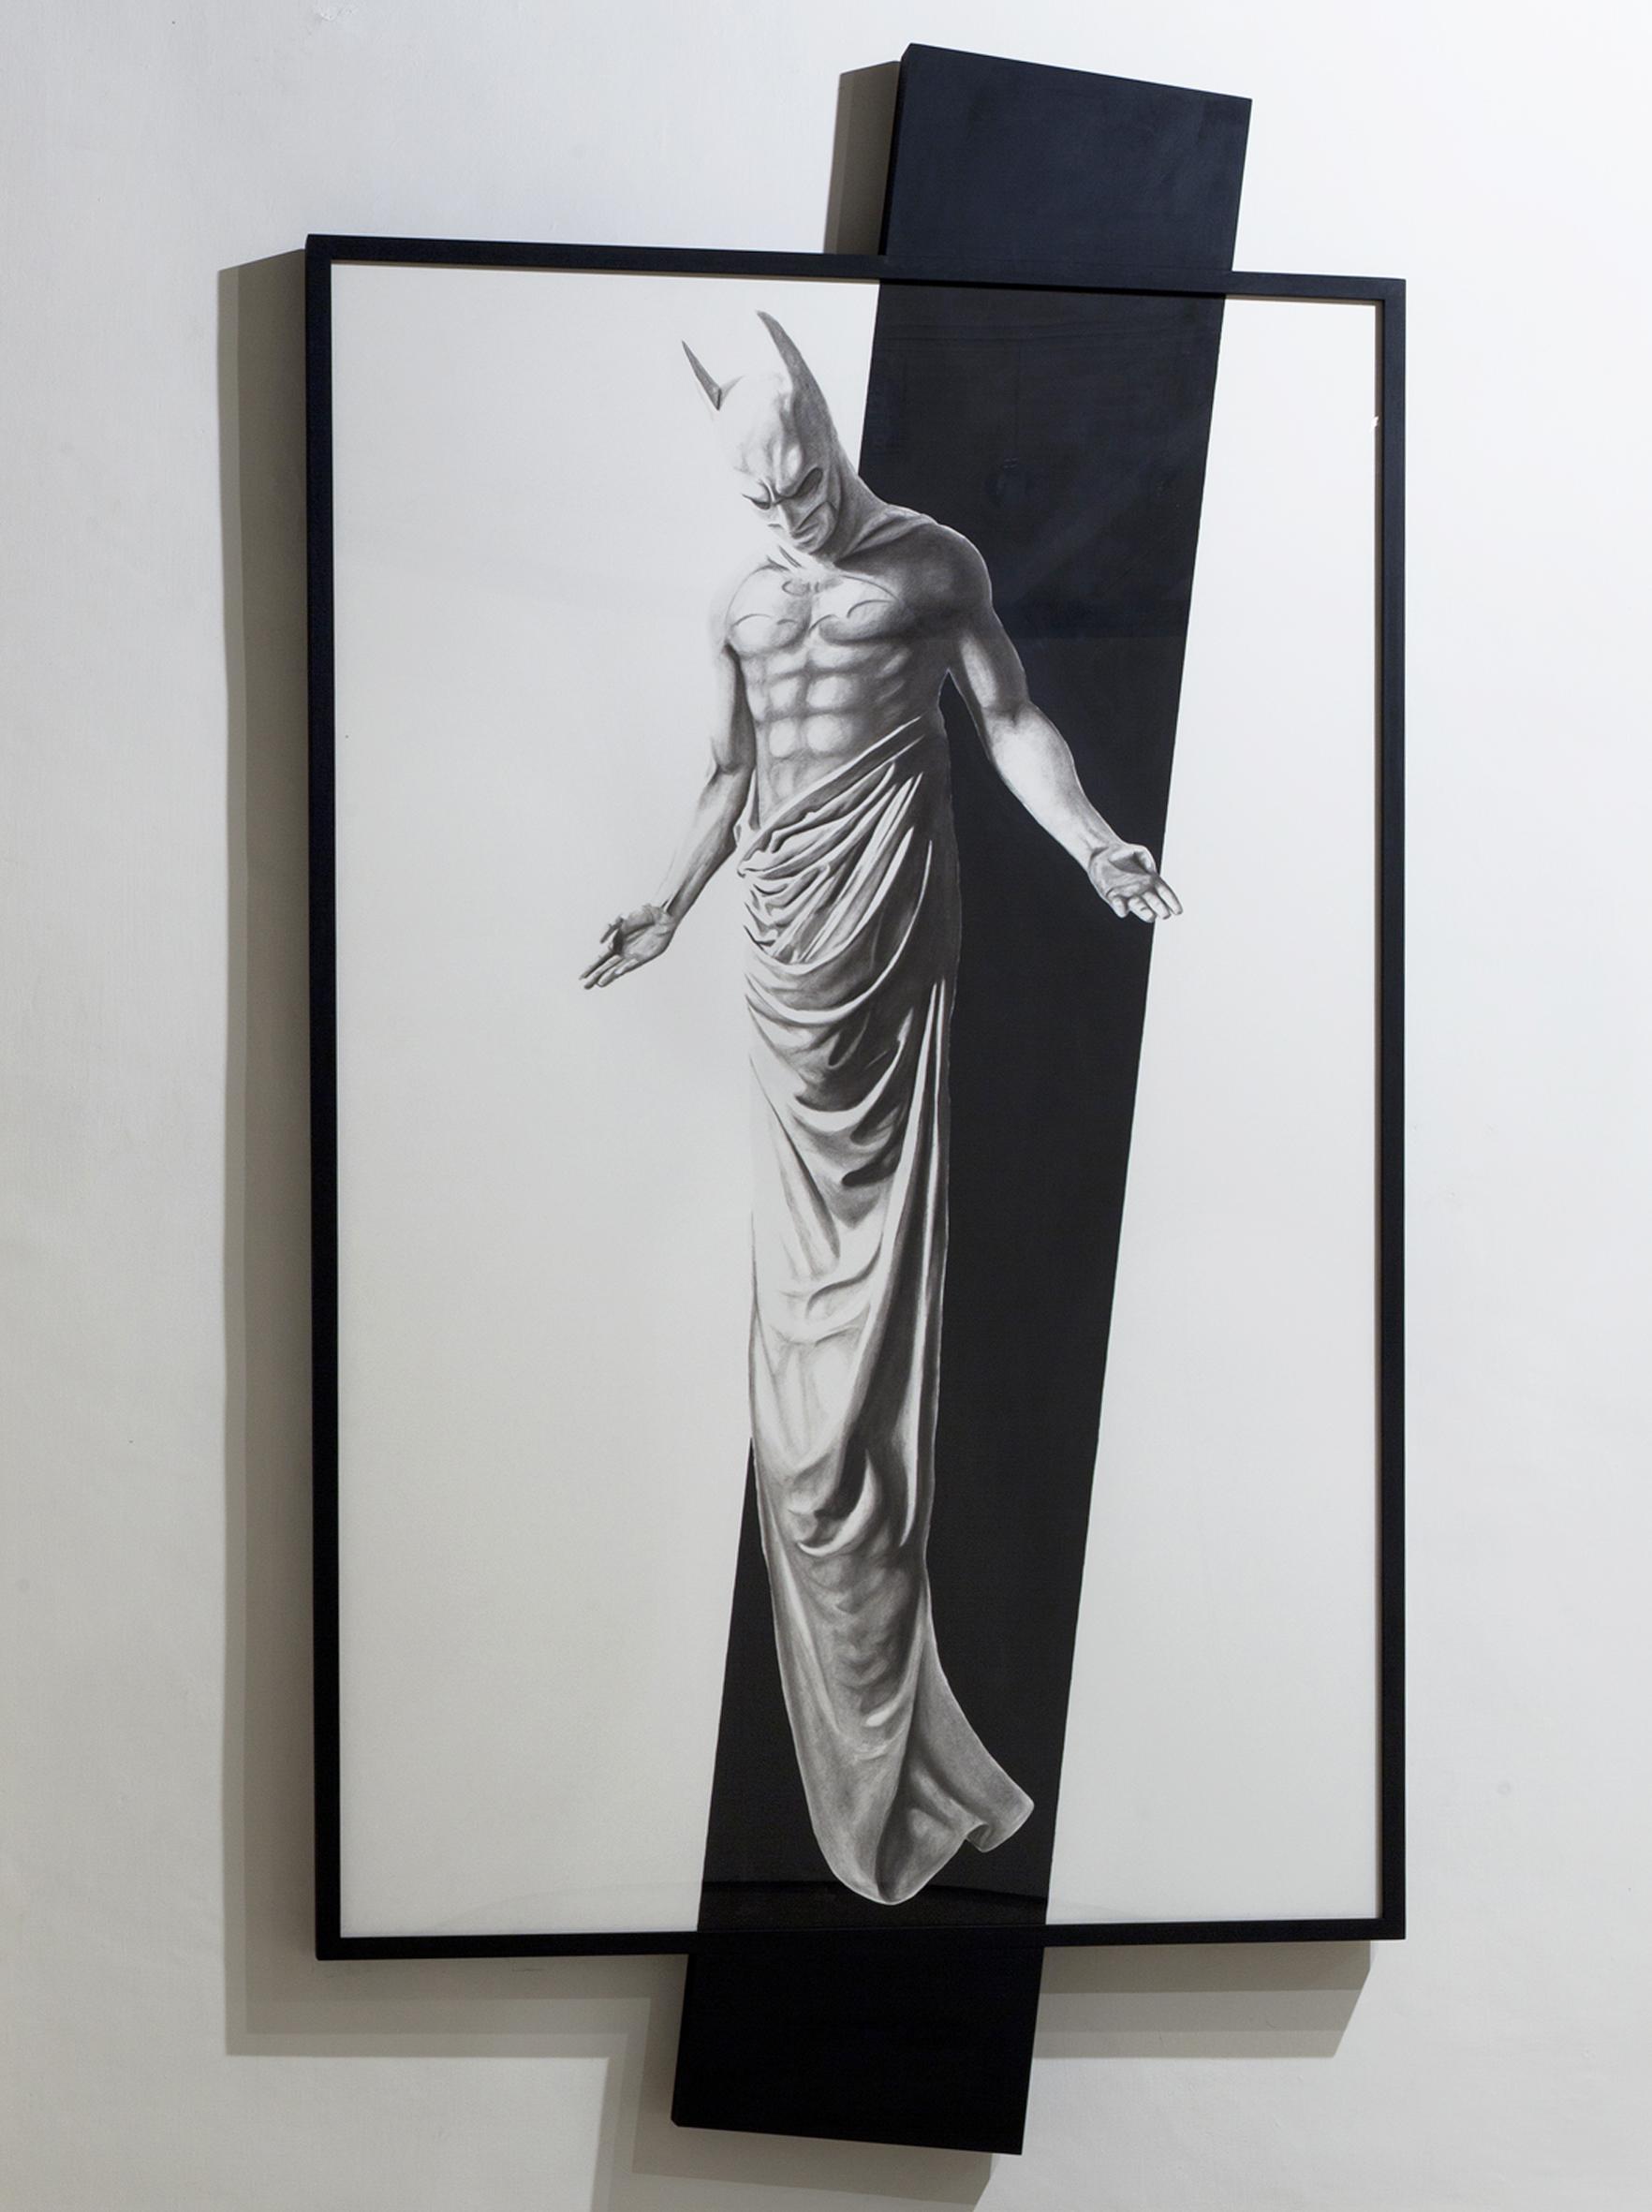 In Excelsis 3 , 2011 . Charcoal, paper, wood, enamel paint, 280x144x7 cm. Photo: Claudio Abate